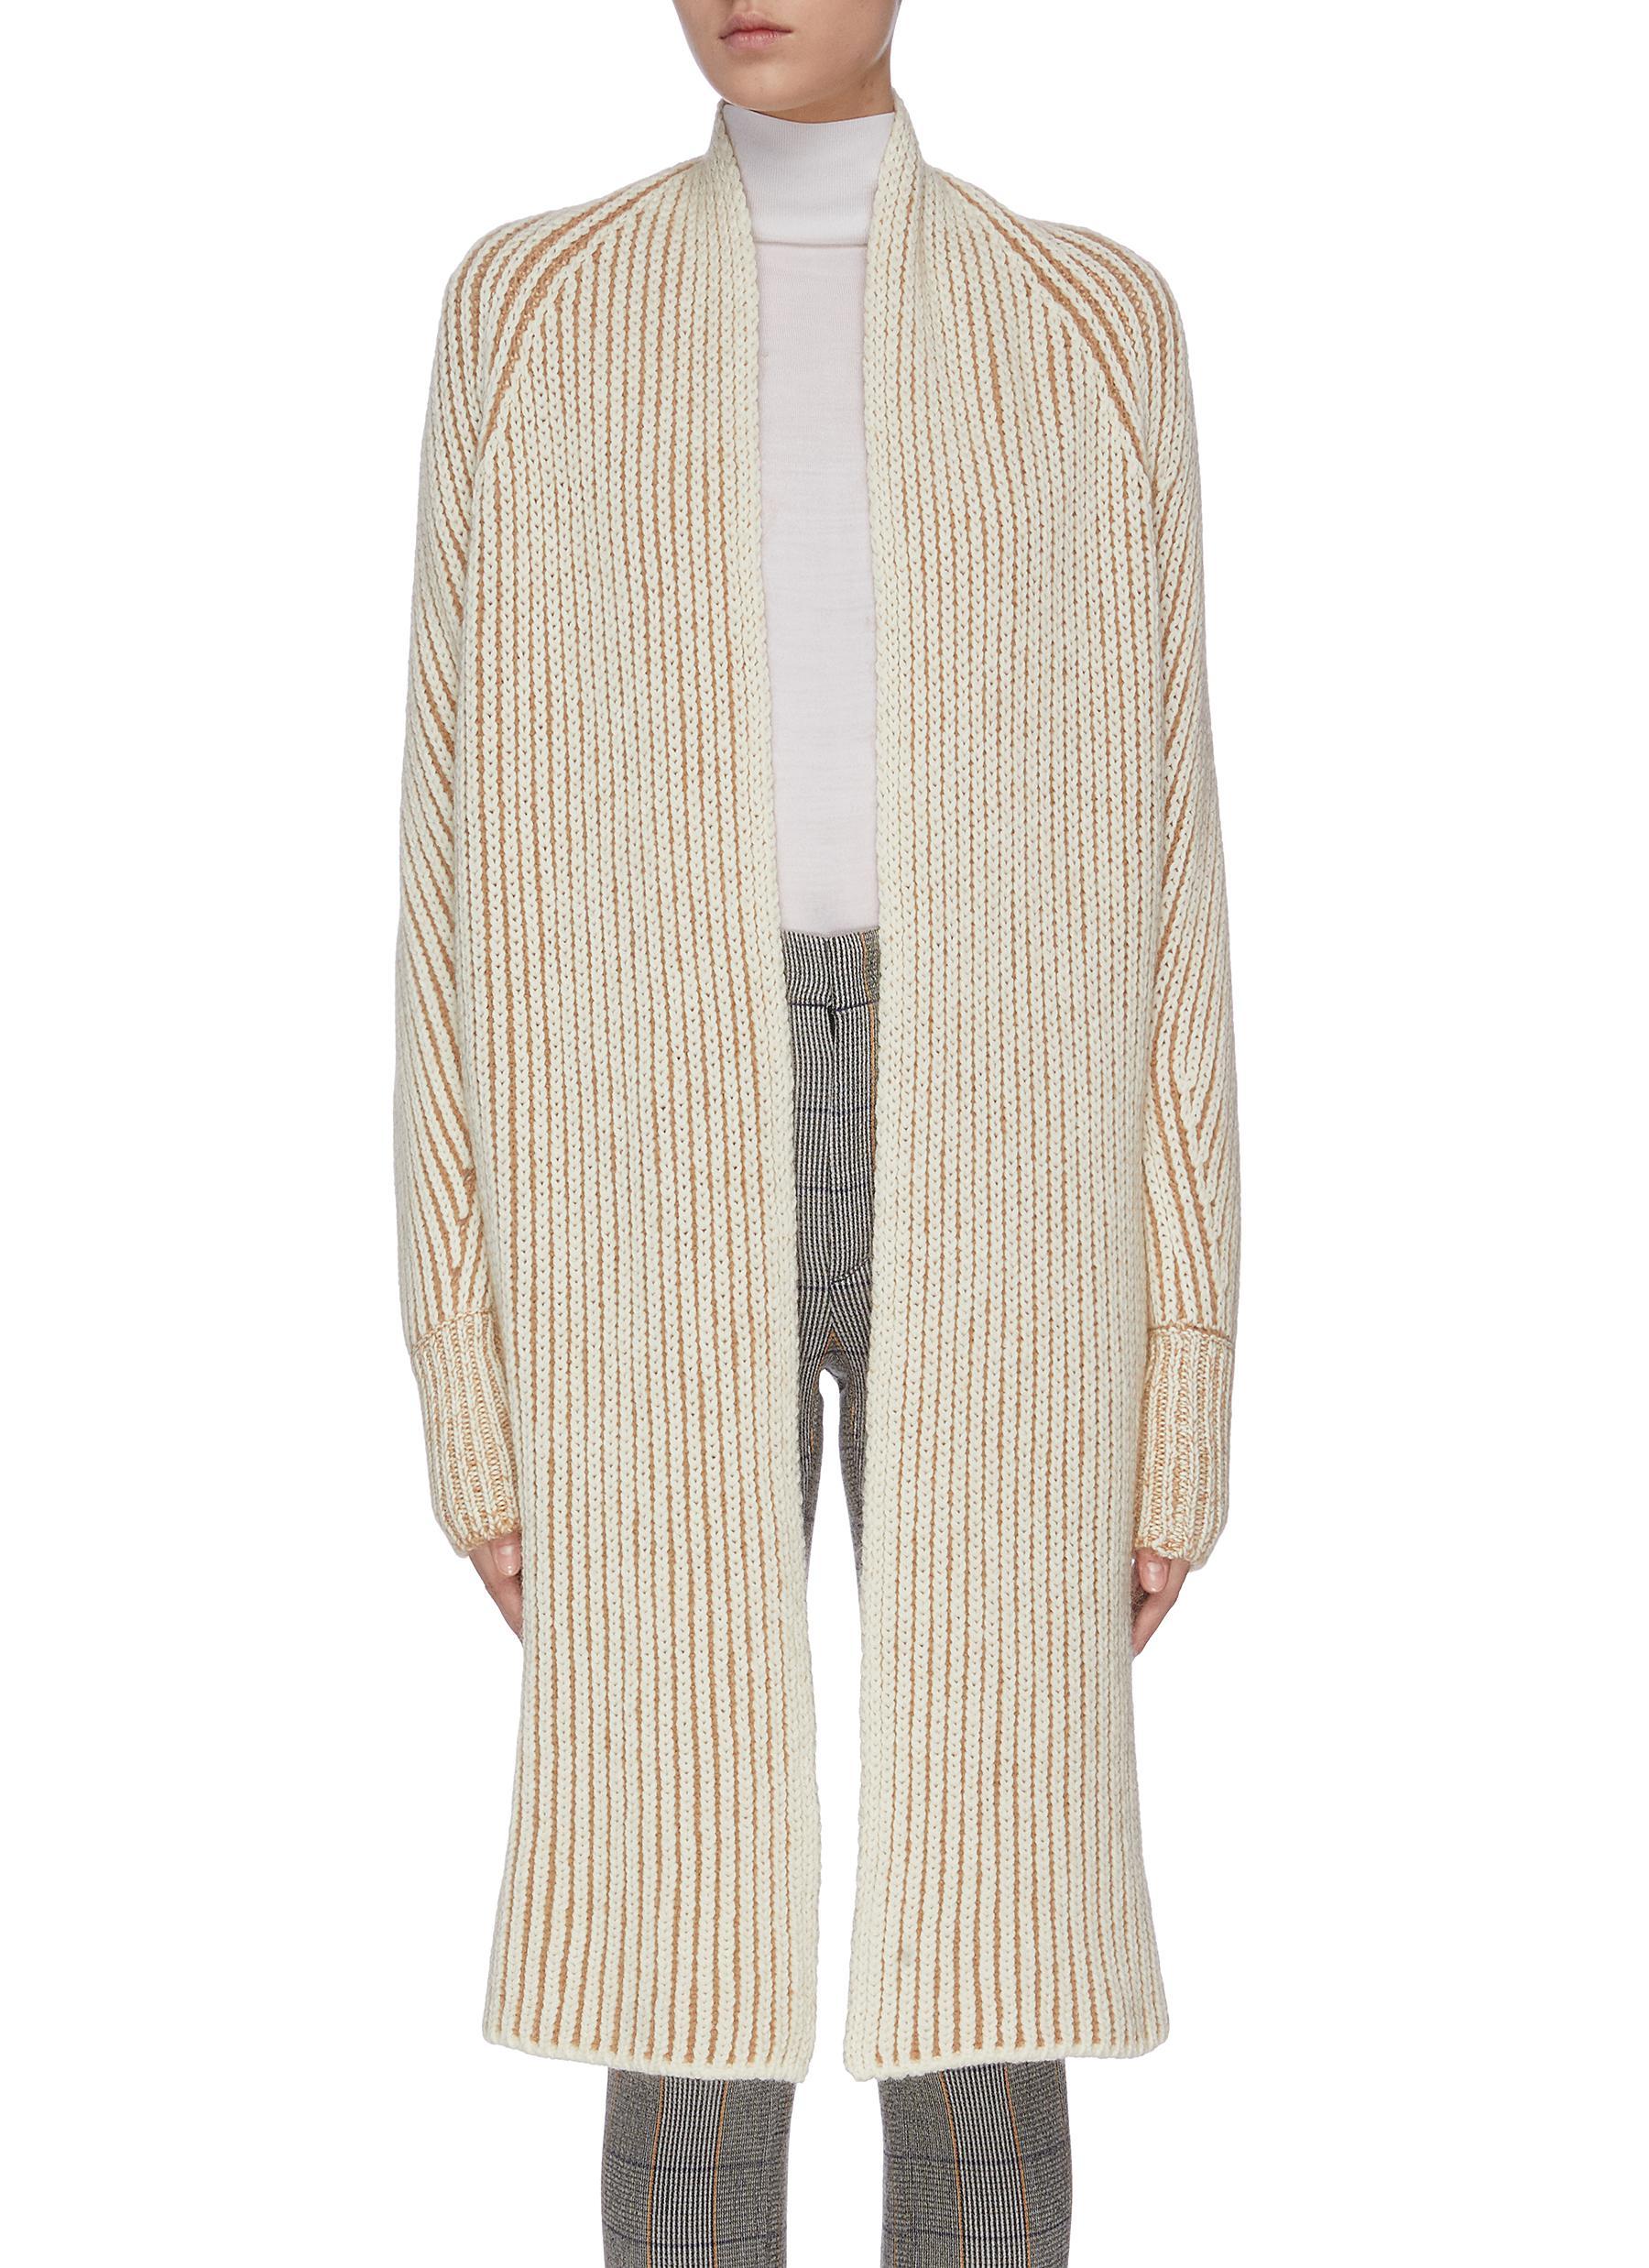 Rib stitch knit long open cardigan by Chloé